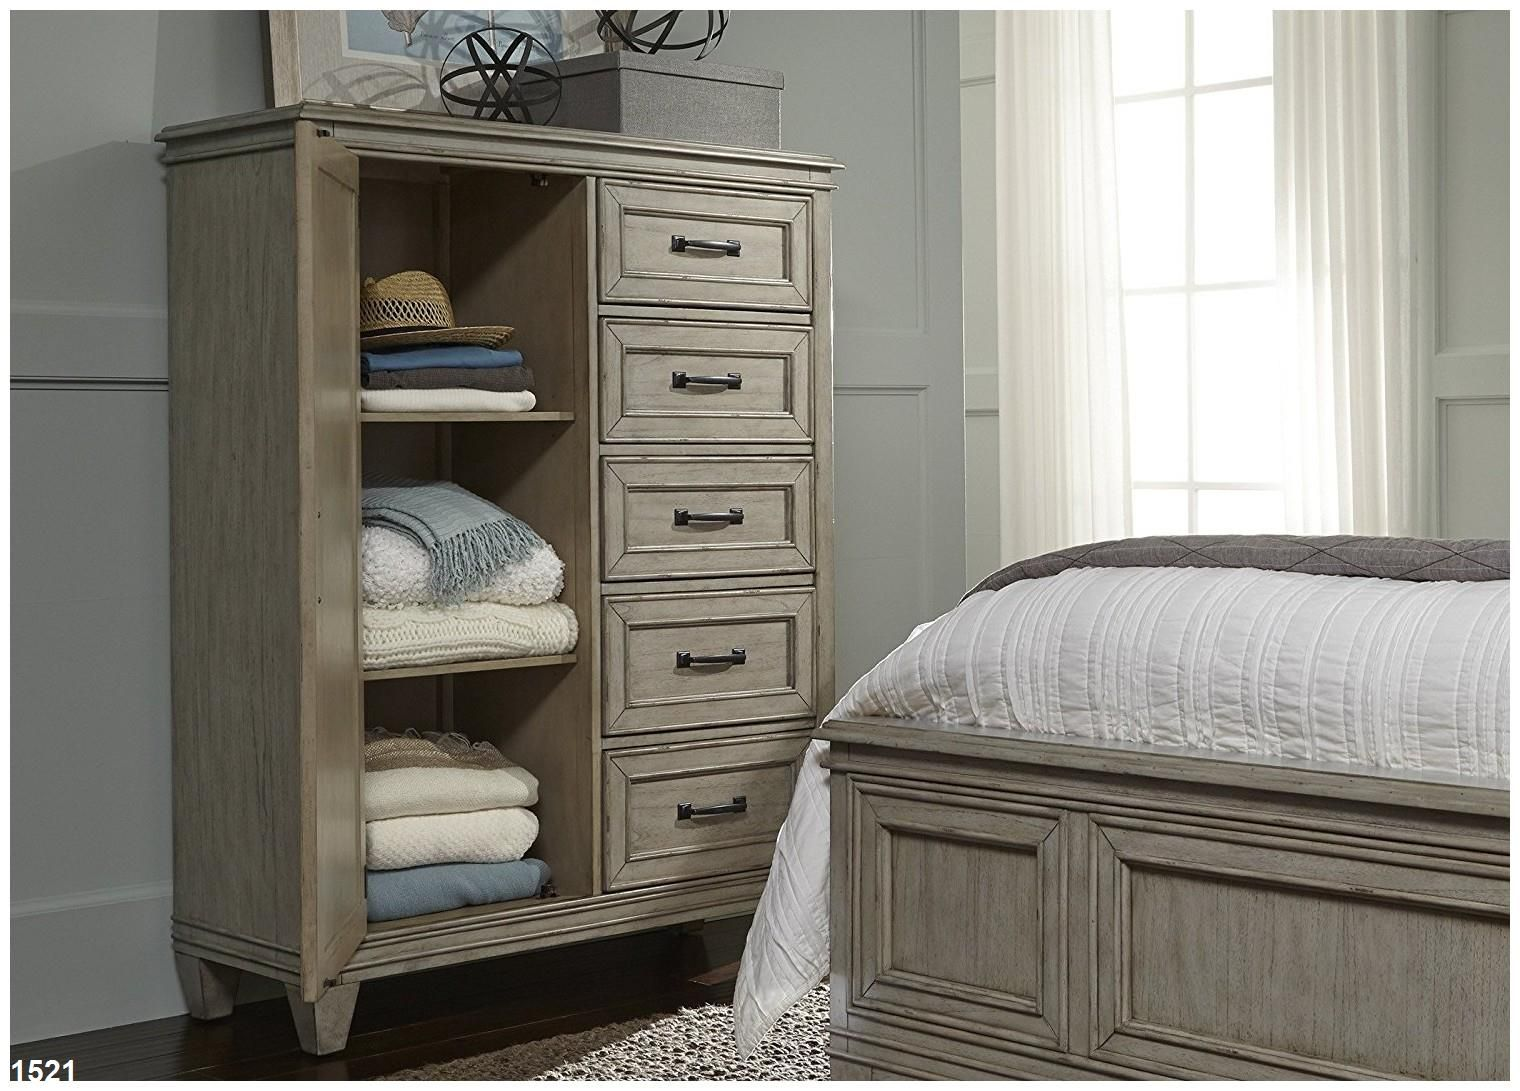 Liberty furniture grayton grove bedroom door chest driftwood finish